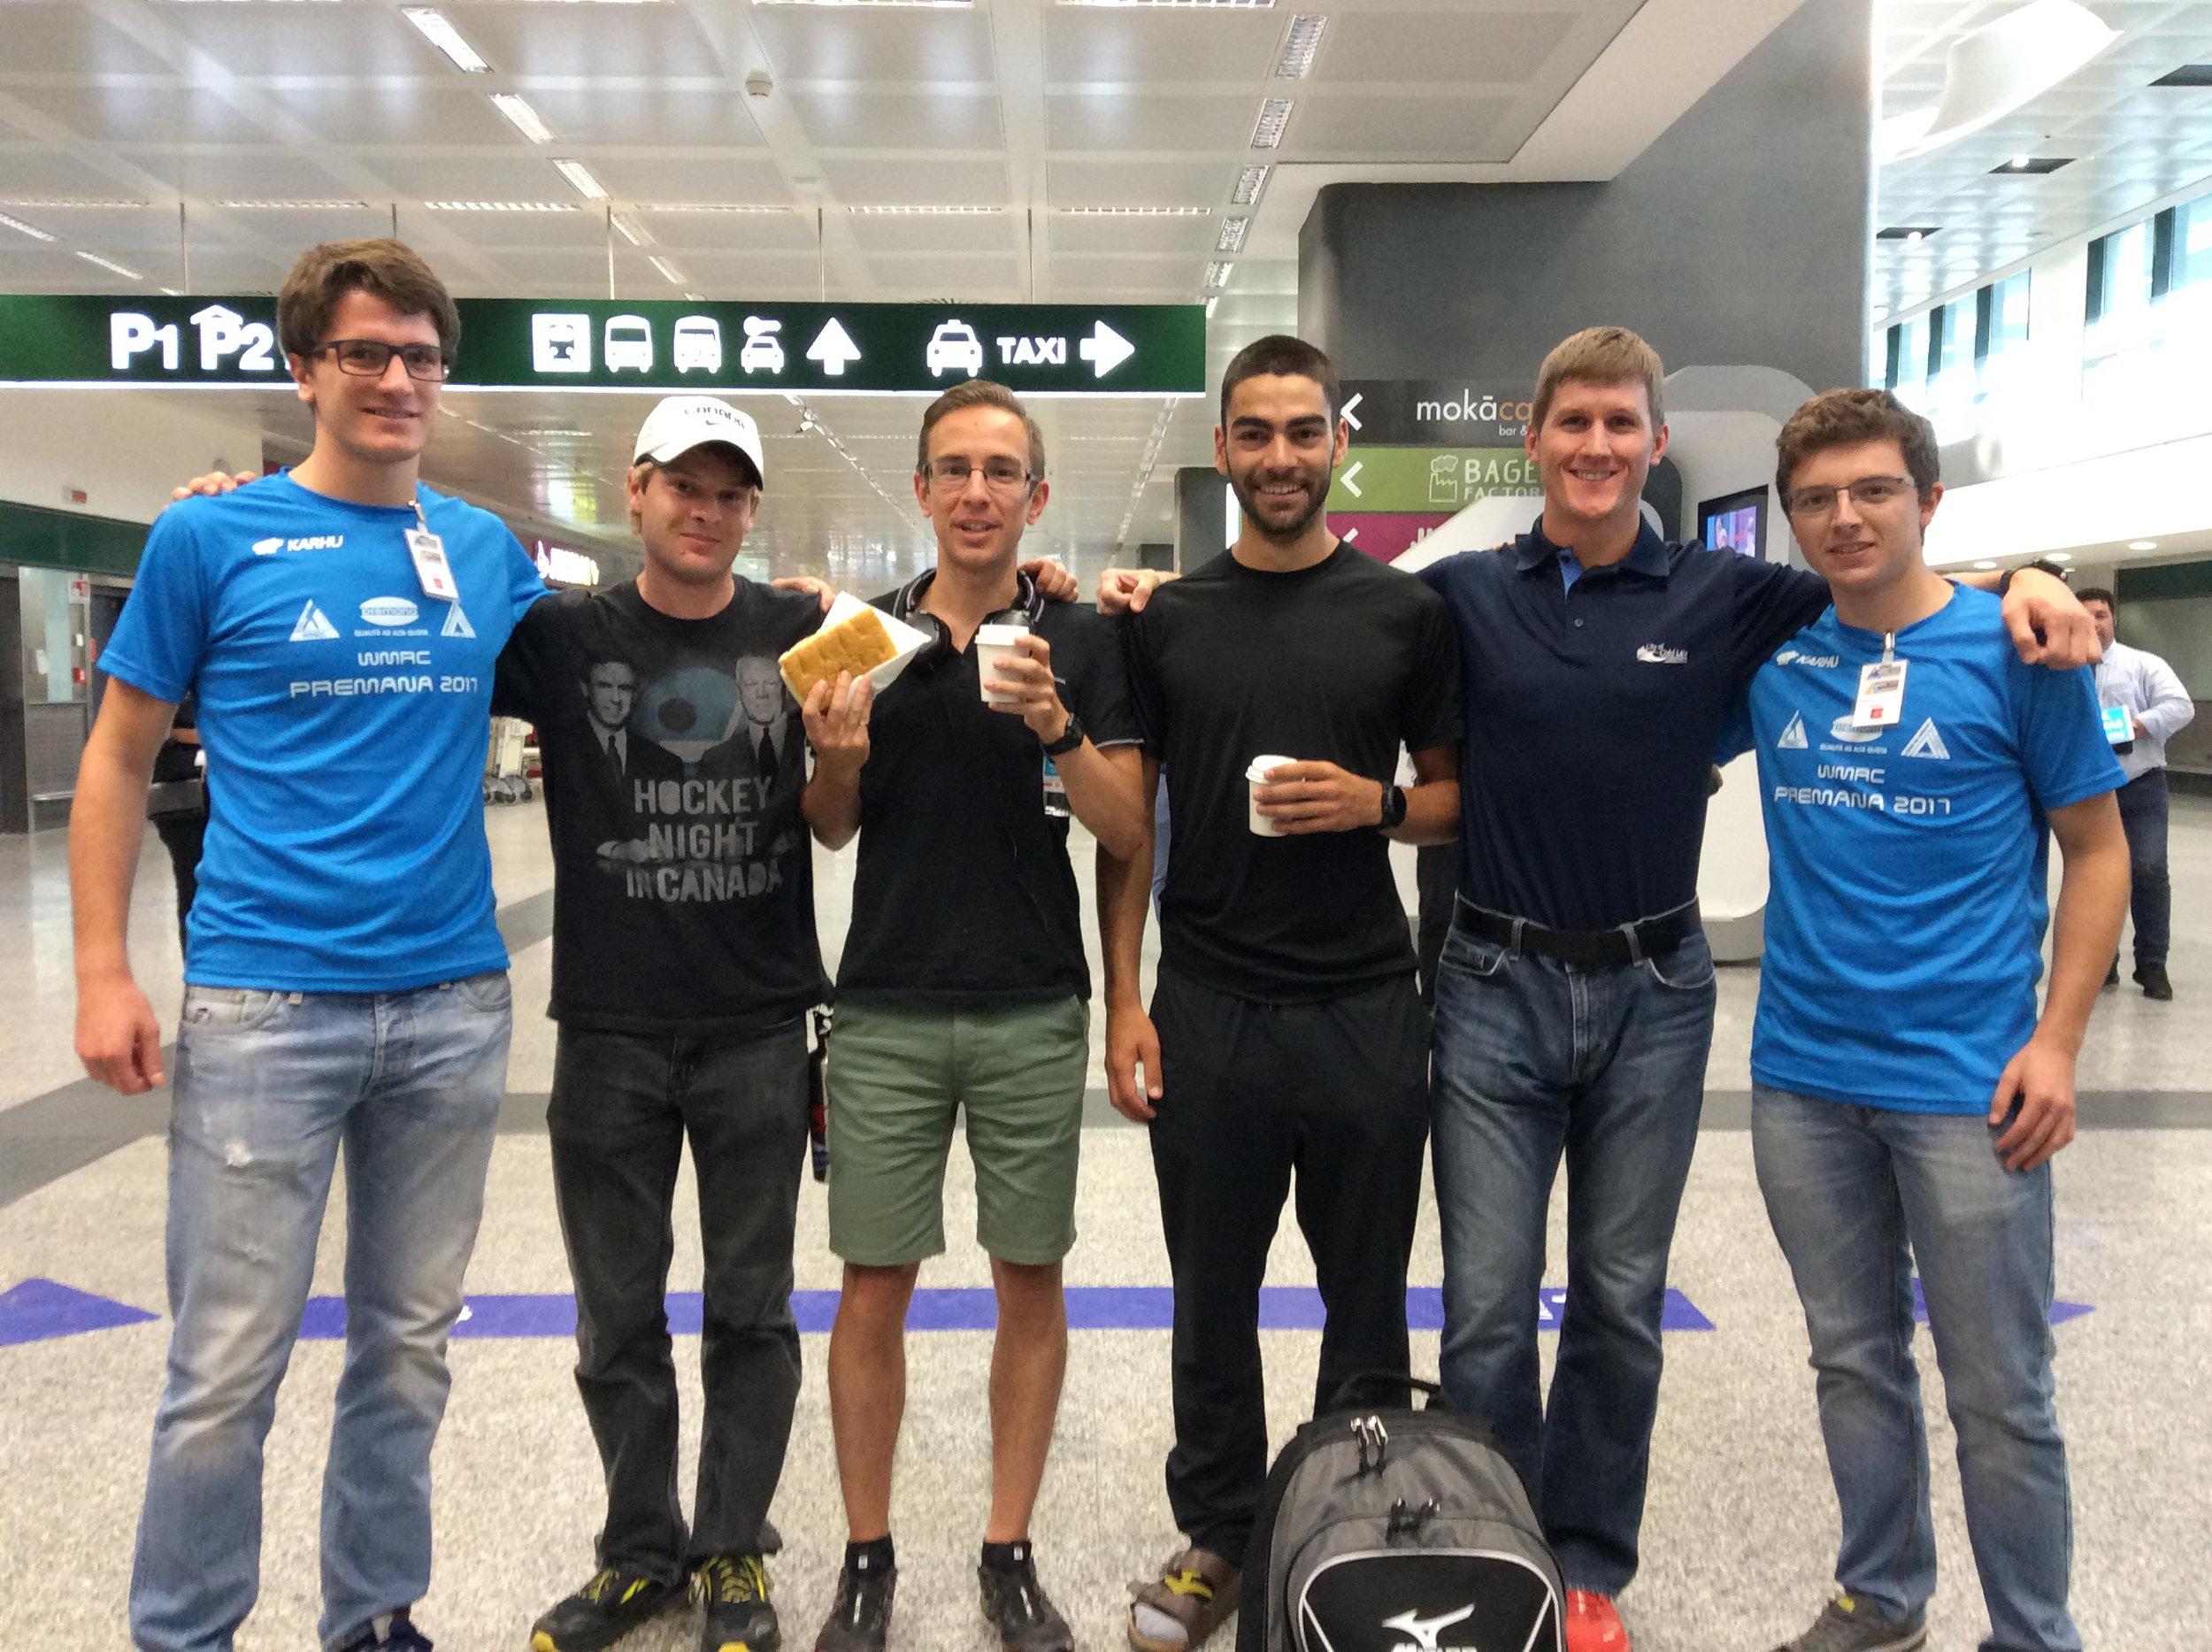 Mario, Gareth, Allan, MattT, MattS and Nicola at the Milan Malpensa Airport